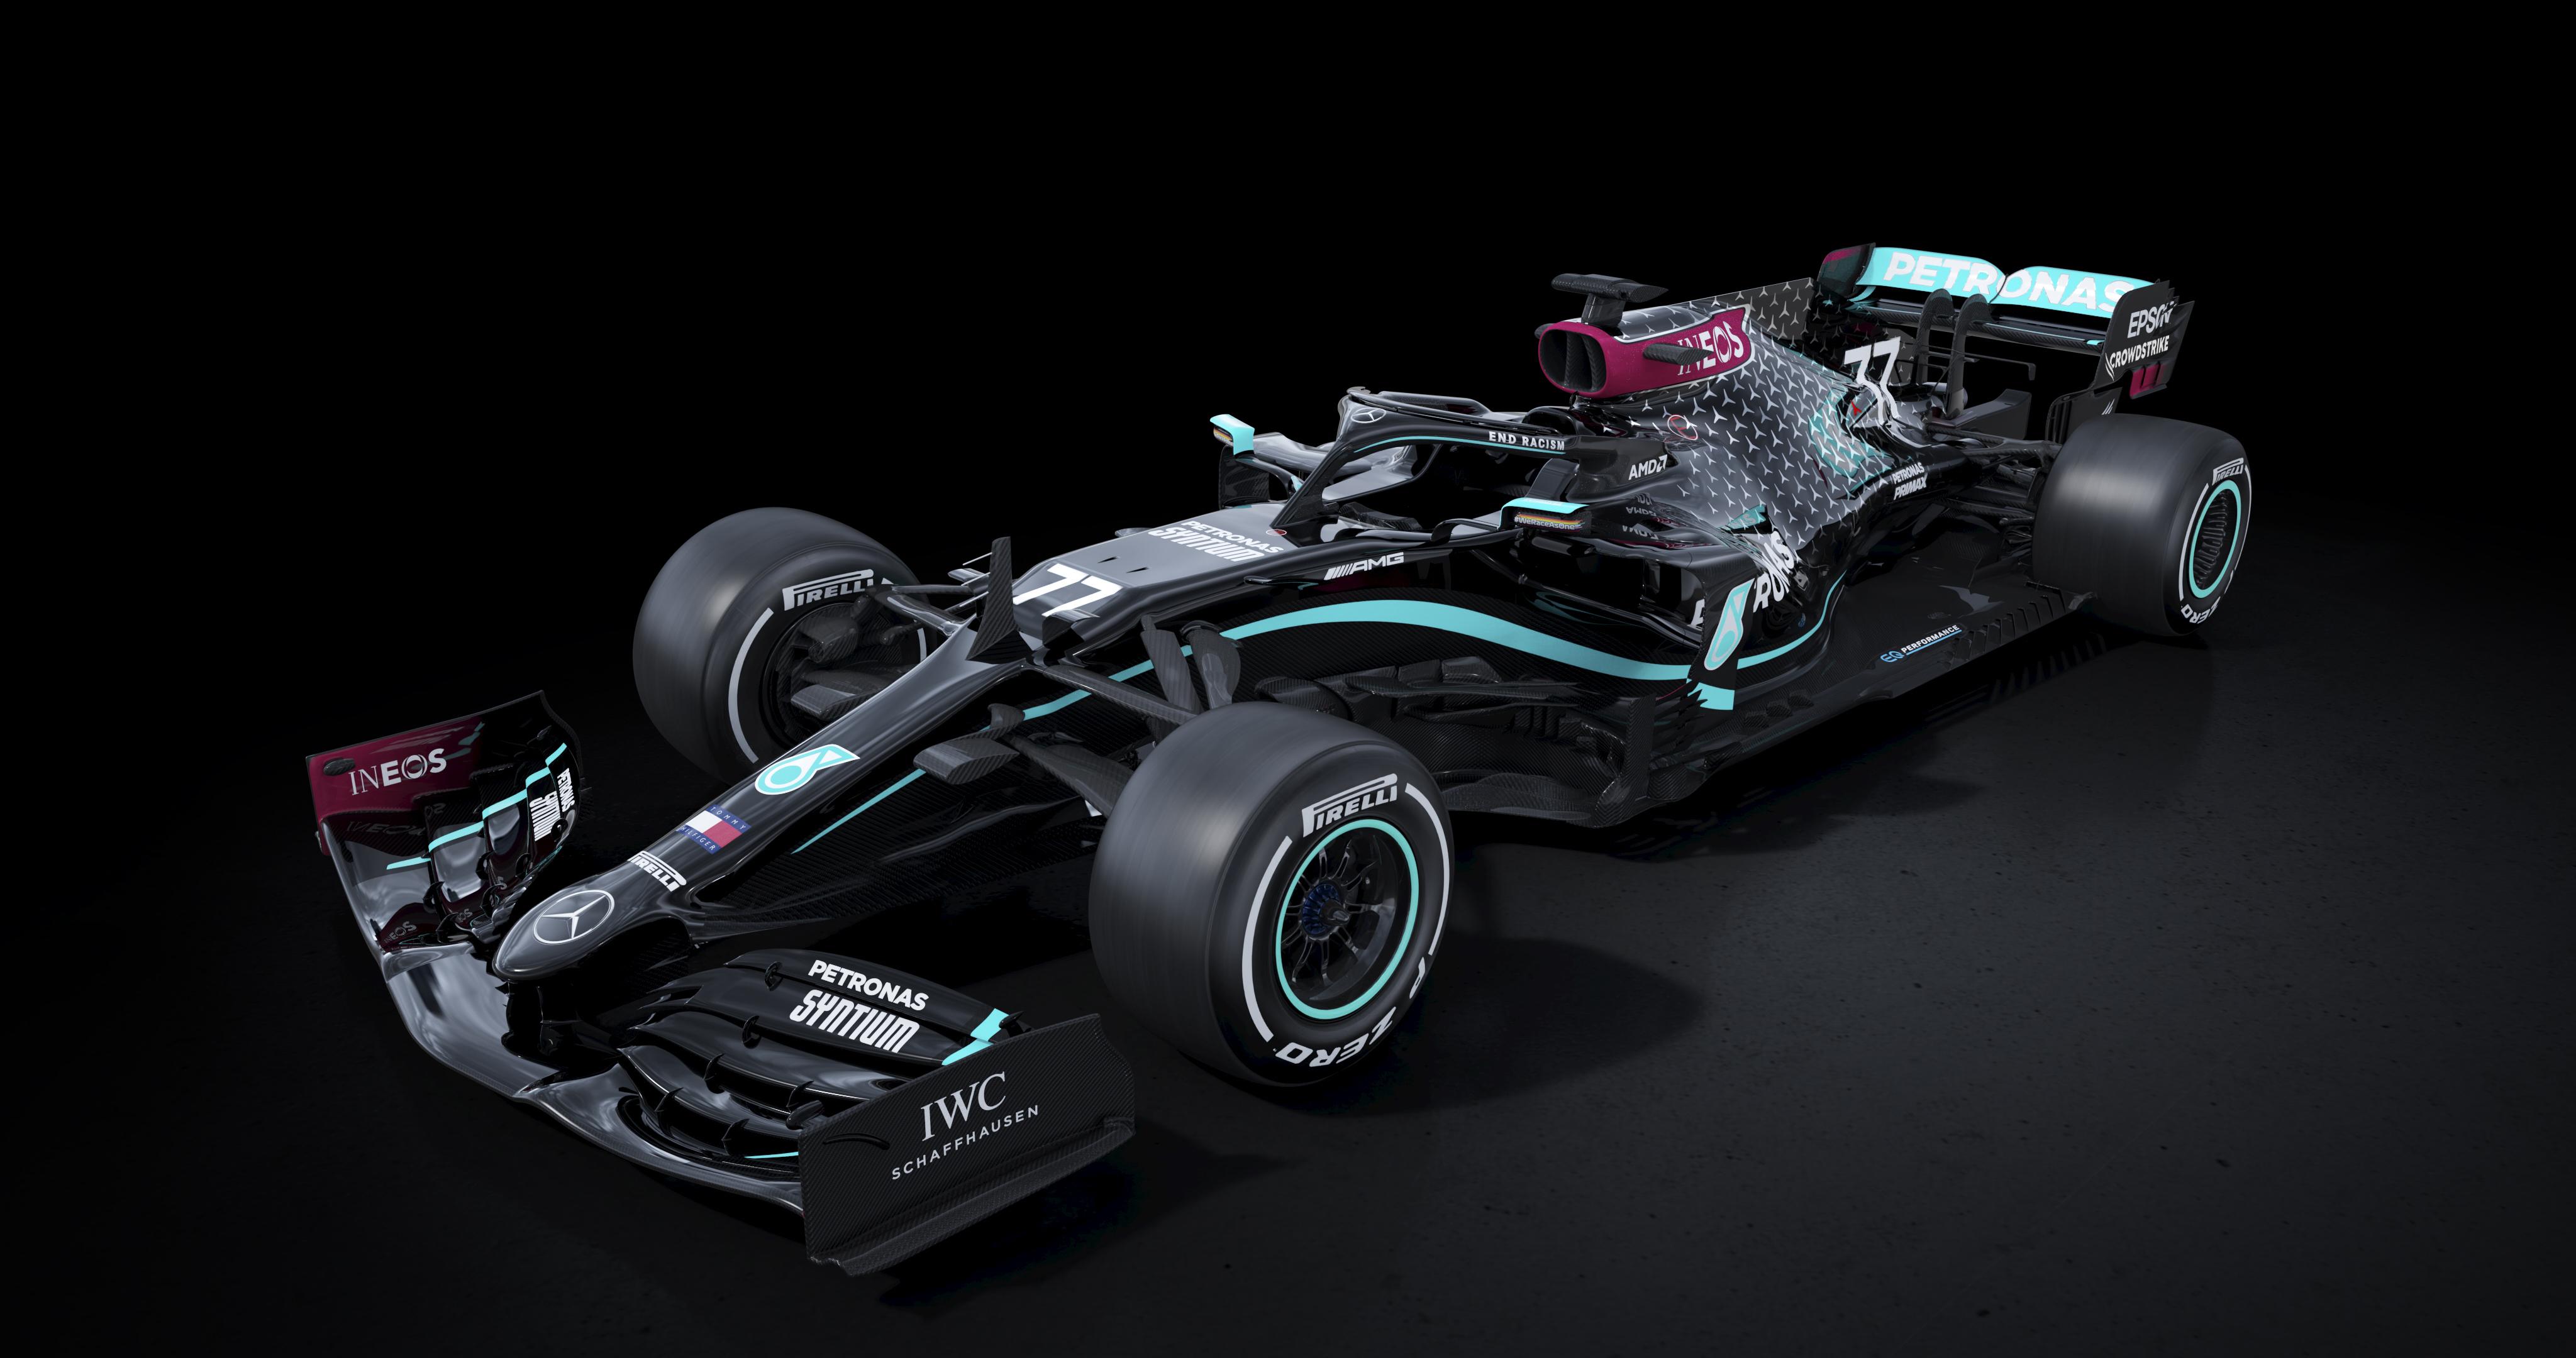 Mercedes Amg F1 W11 Eq Performance 4k Wallpaper 2020 F1 Cars Electric Race Cars Black Dark 1632